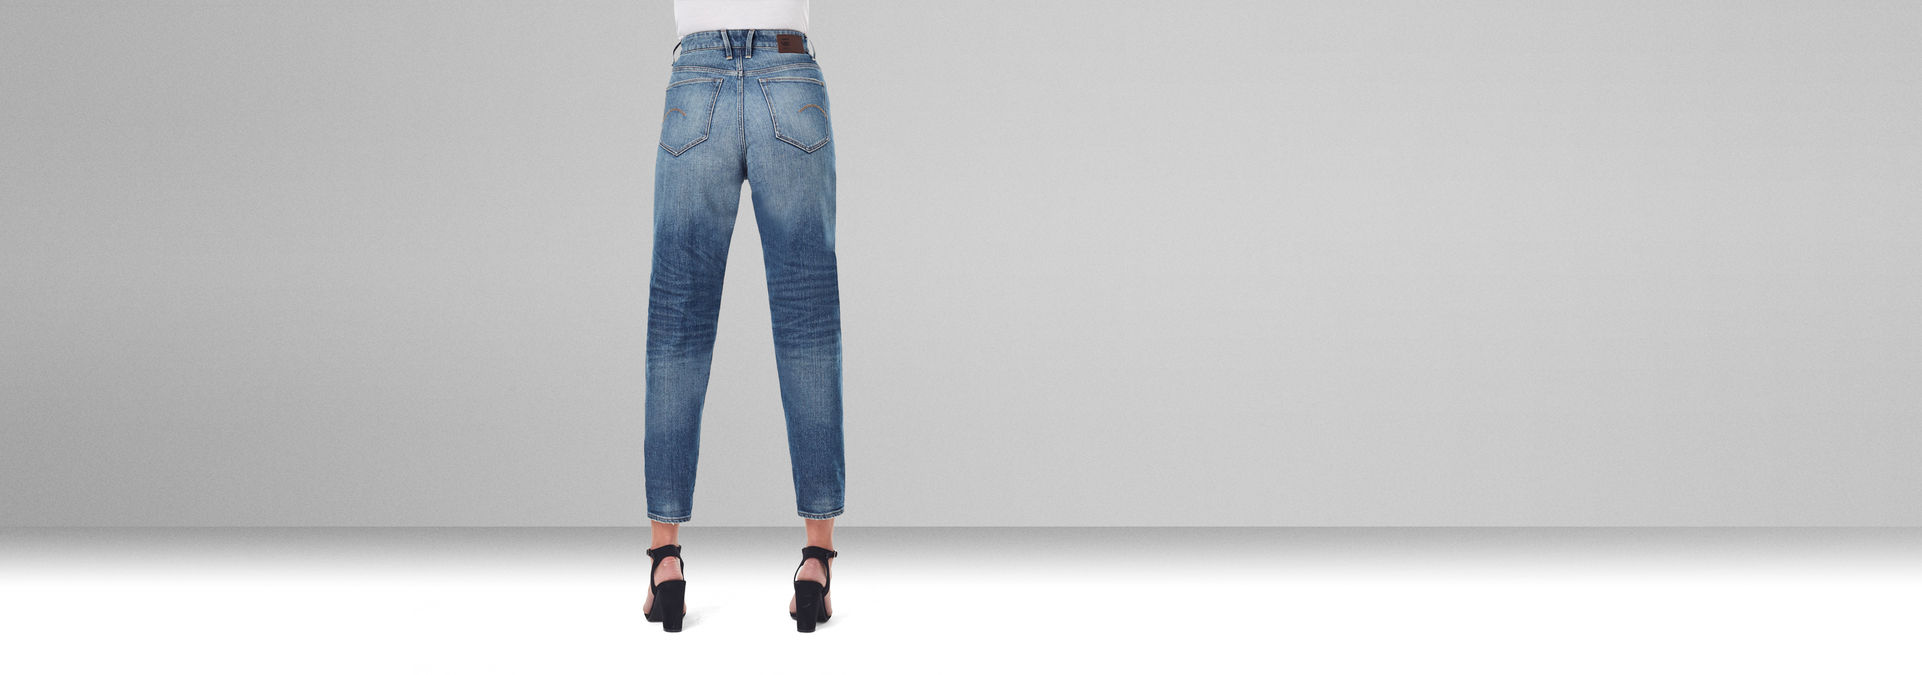 Janeh Ultra High Mom Ankle Jeans   Mittelblau   G Star RAW®